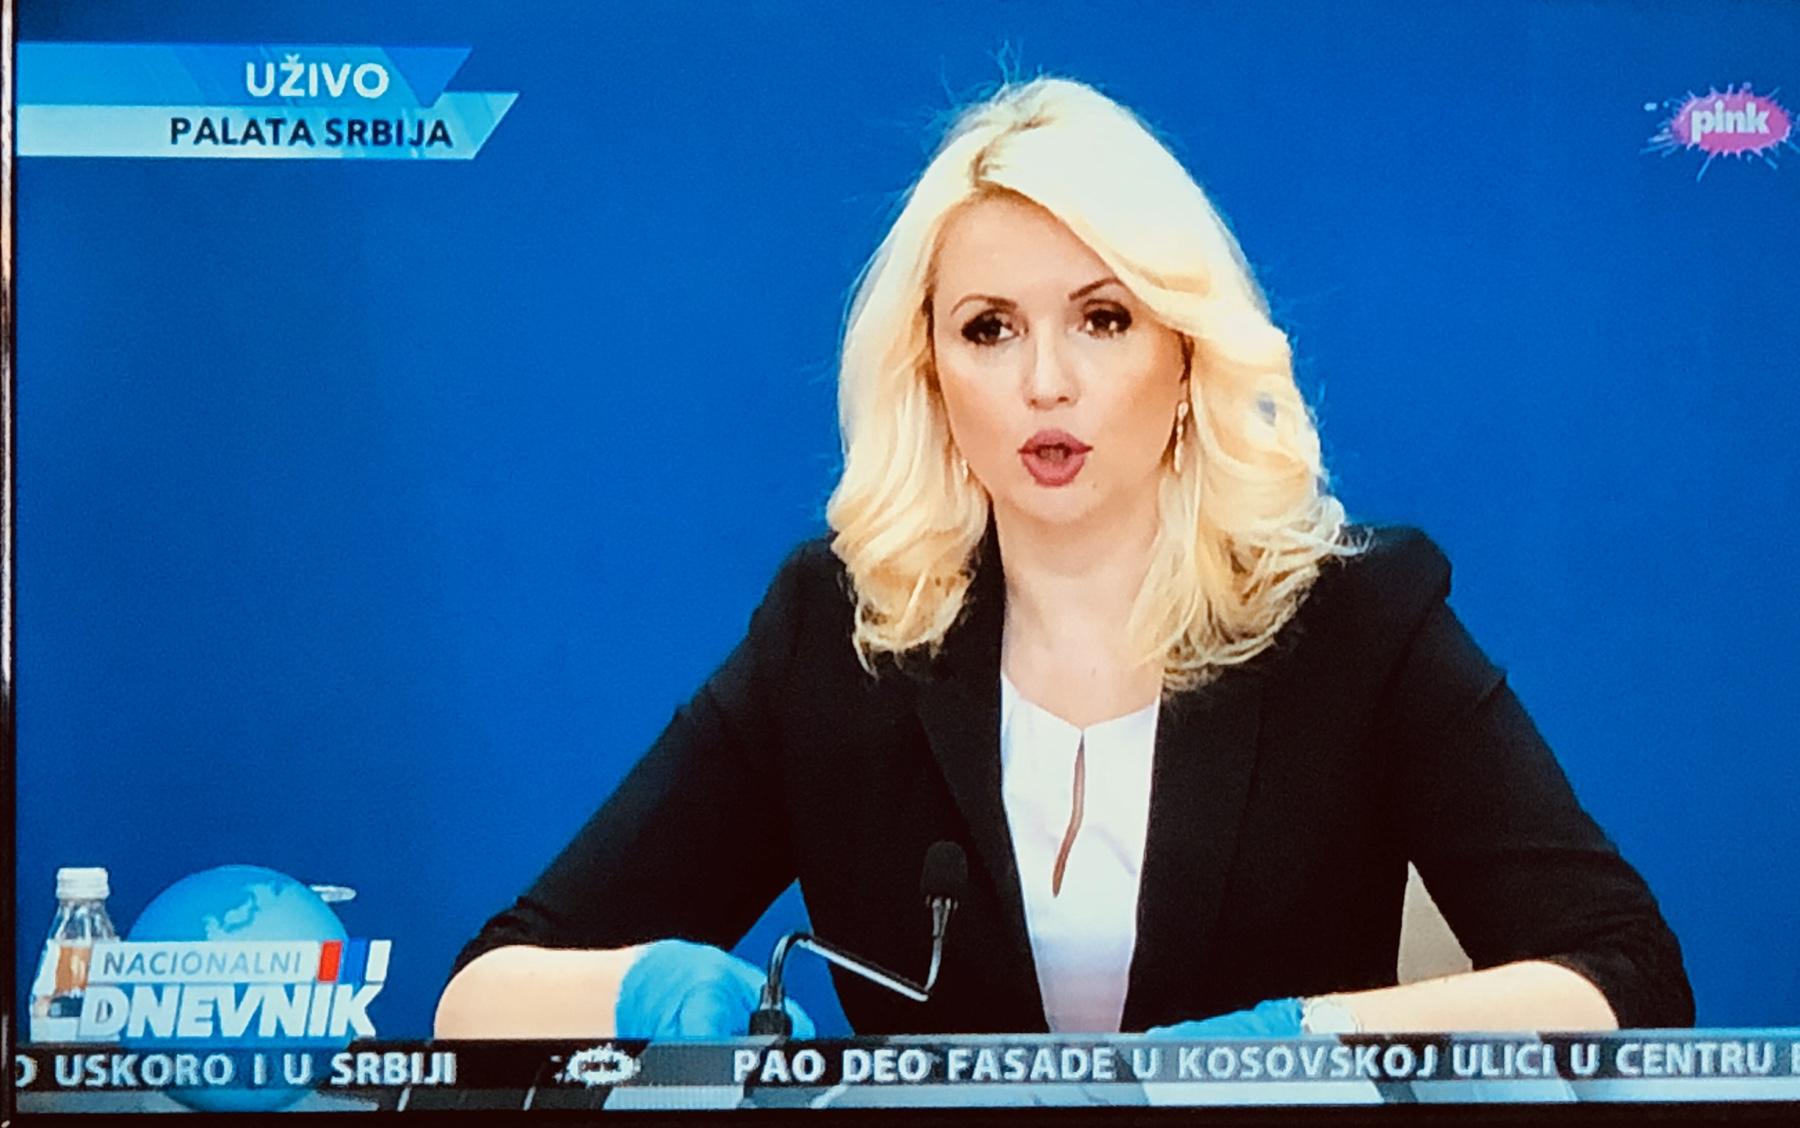 Др Кисић, фото: ТВ Пинк, тв пријем